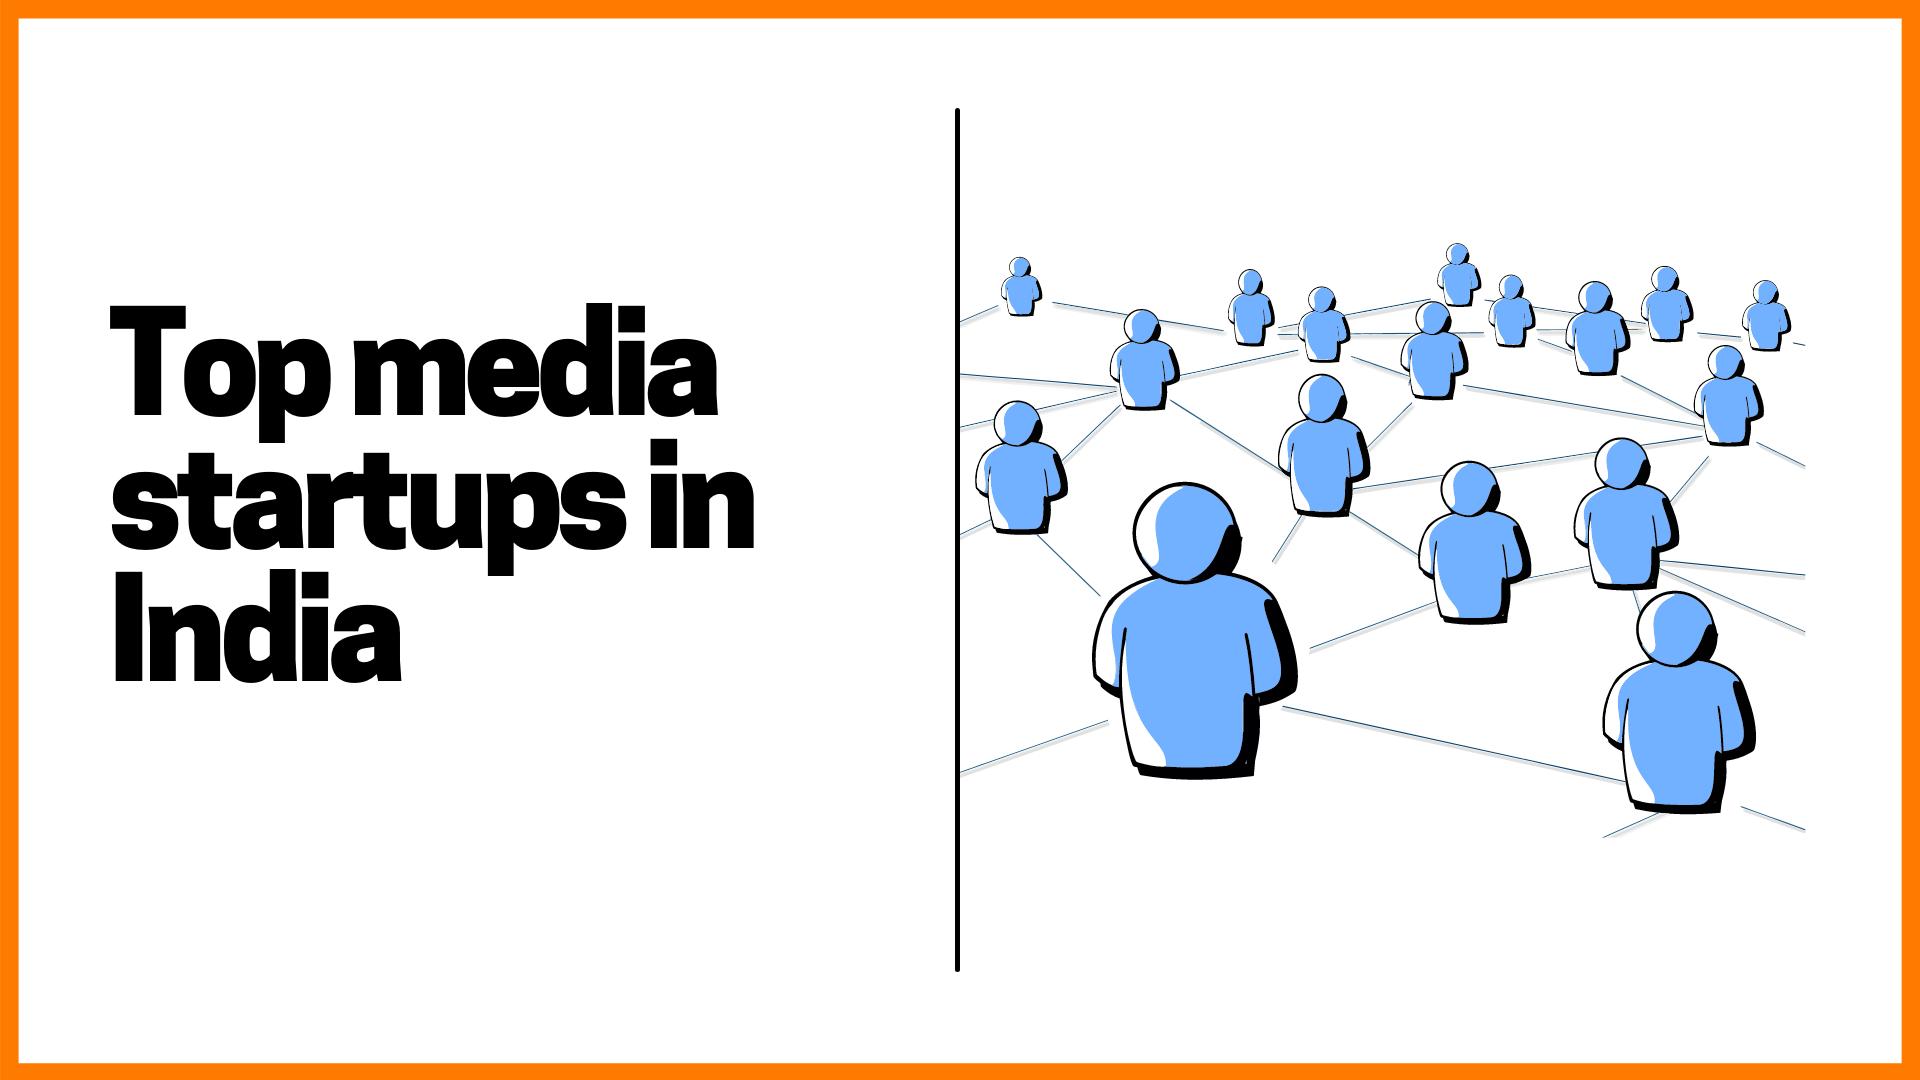 Top Media Startup's in India